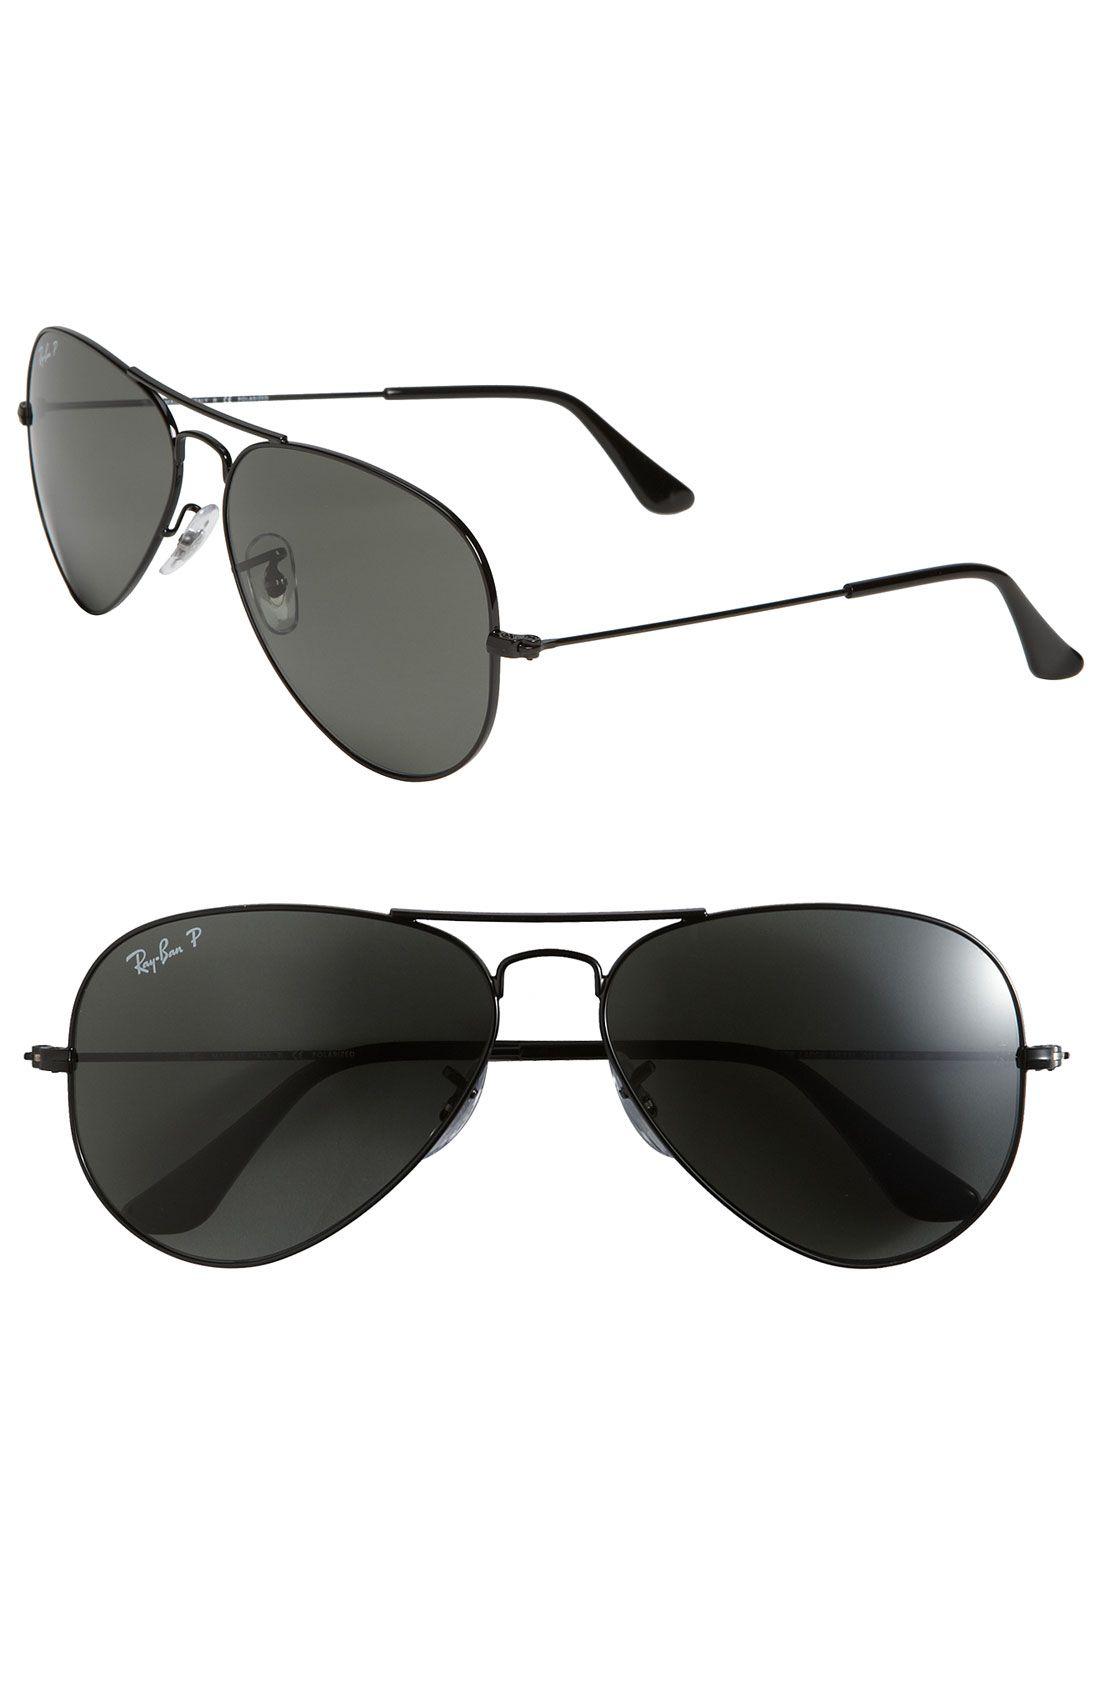 dfacd545590 Ray-Ban  Polarized Original Aviator  58mm Sunglasses